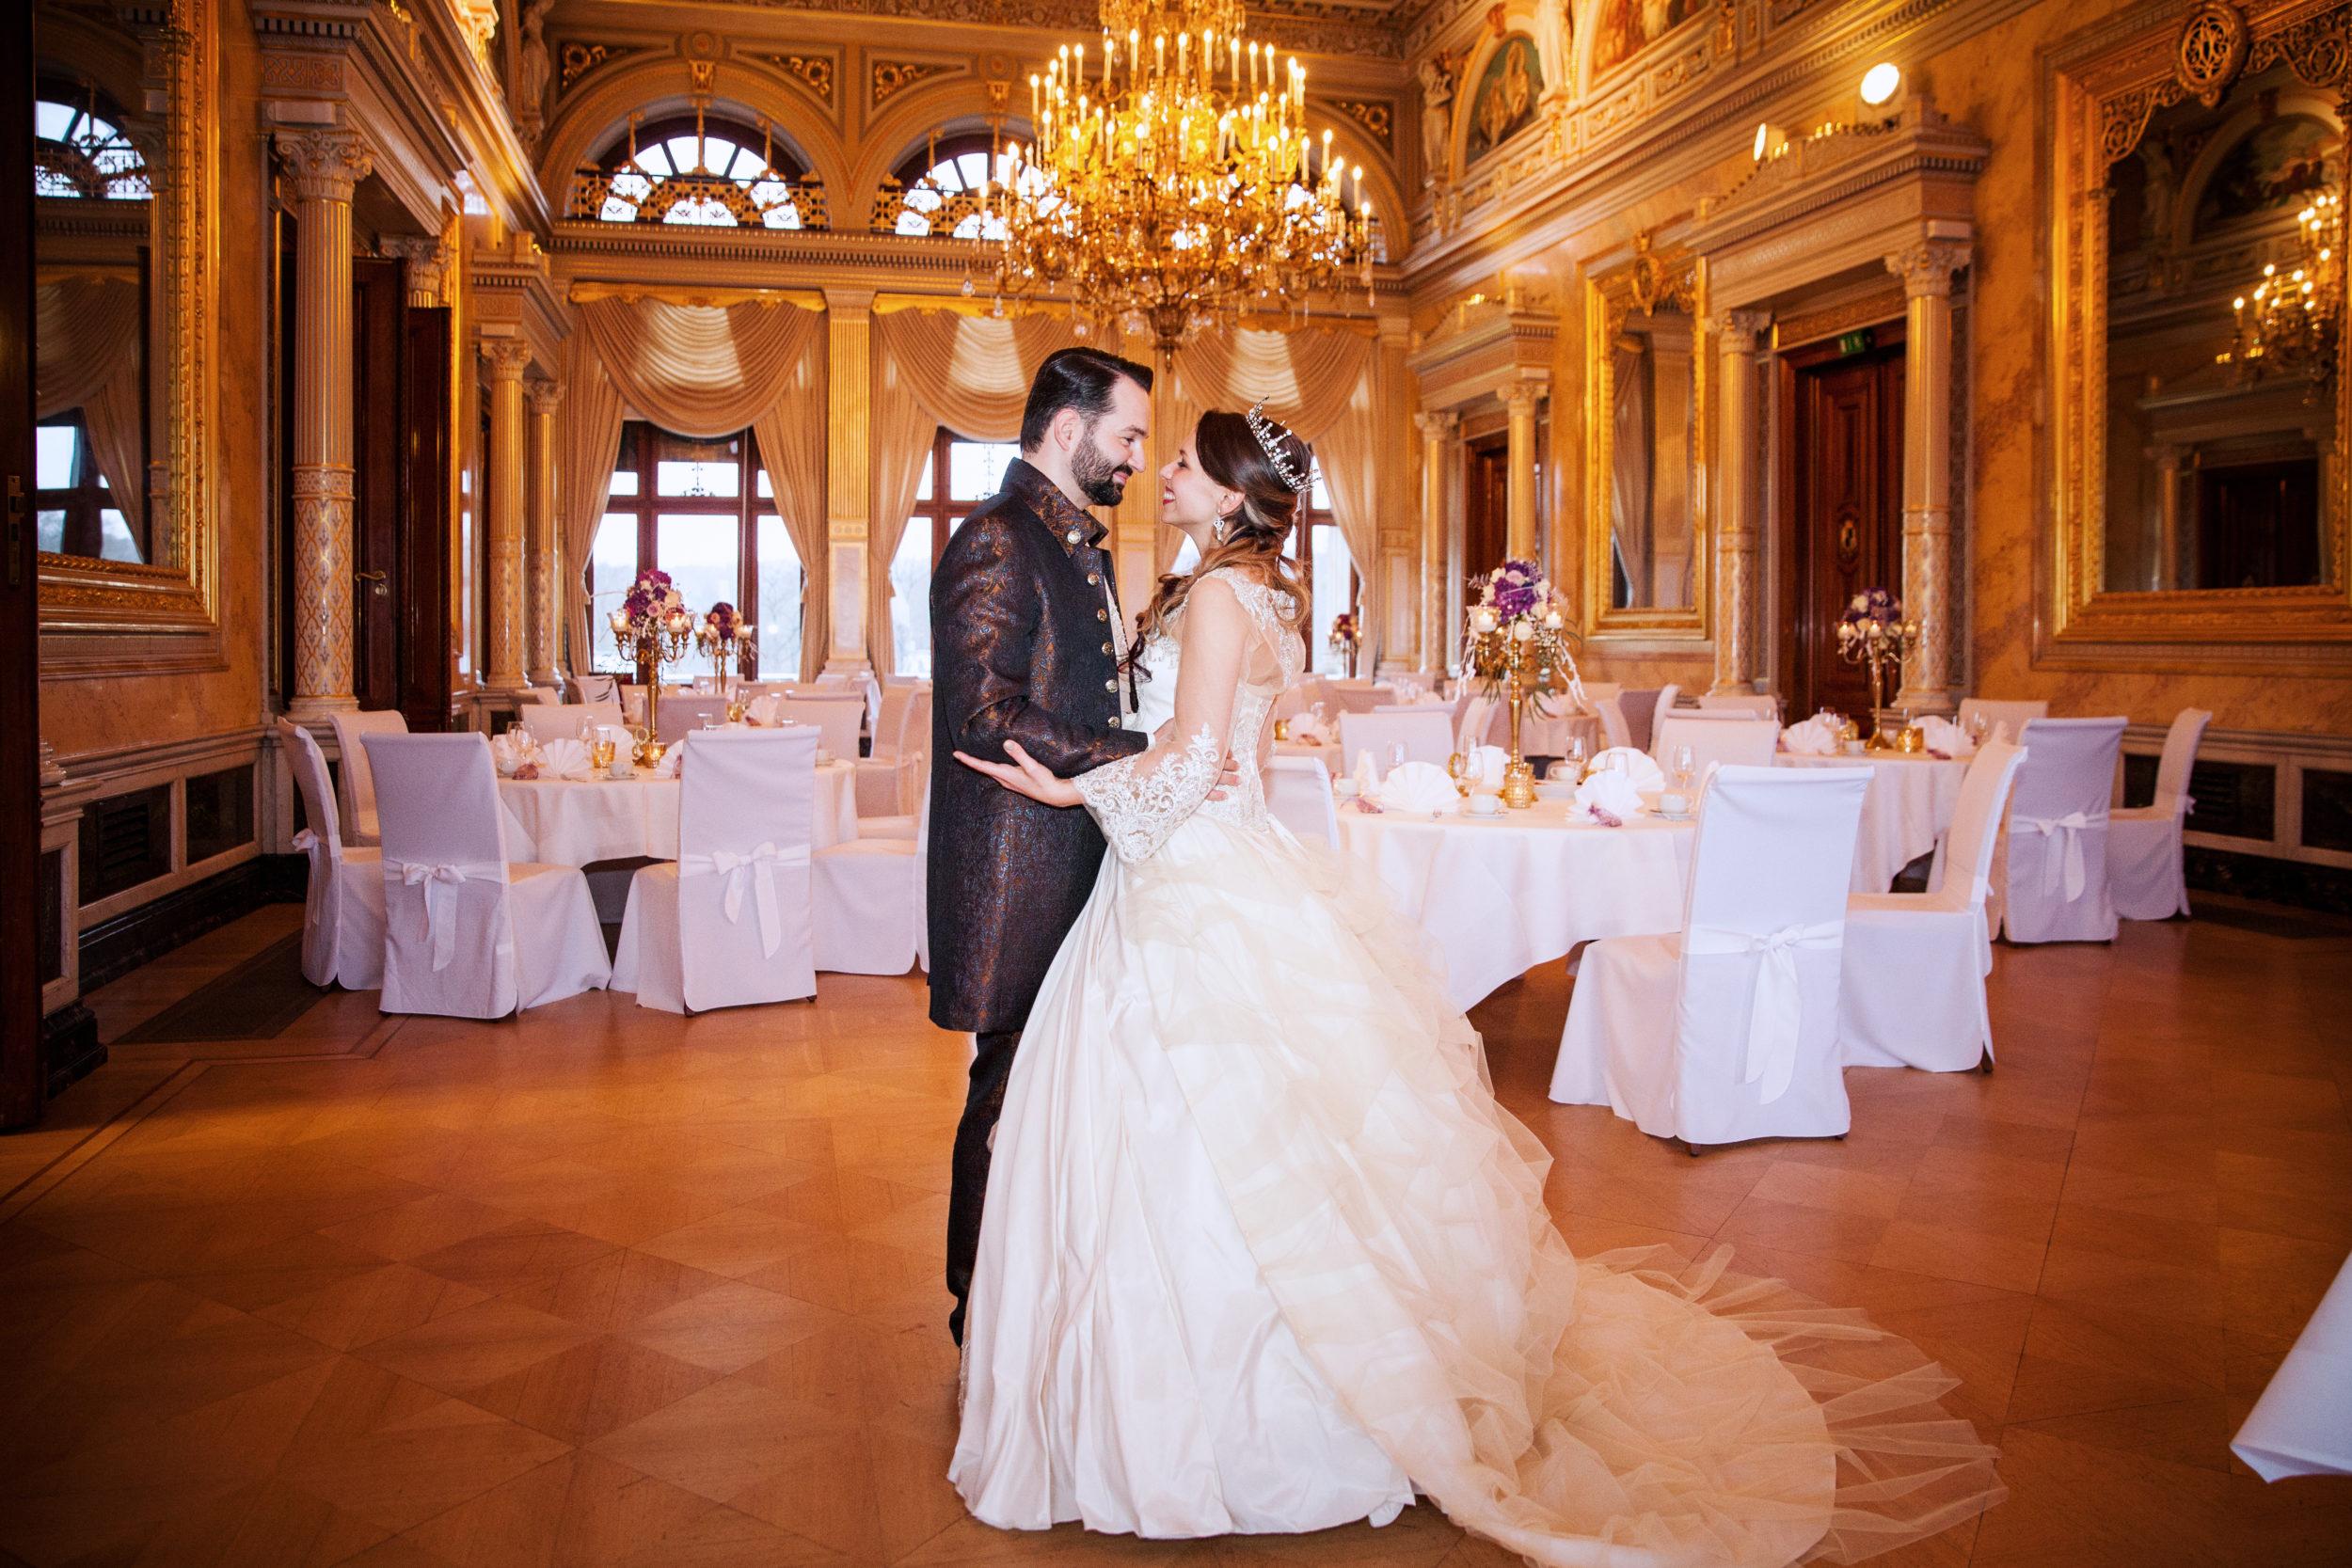 Myrelle Couture Marina Deynega Brautmode Hochzeit Anzug Massgeschneidert Royal Wedding Cm 071